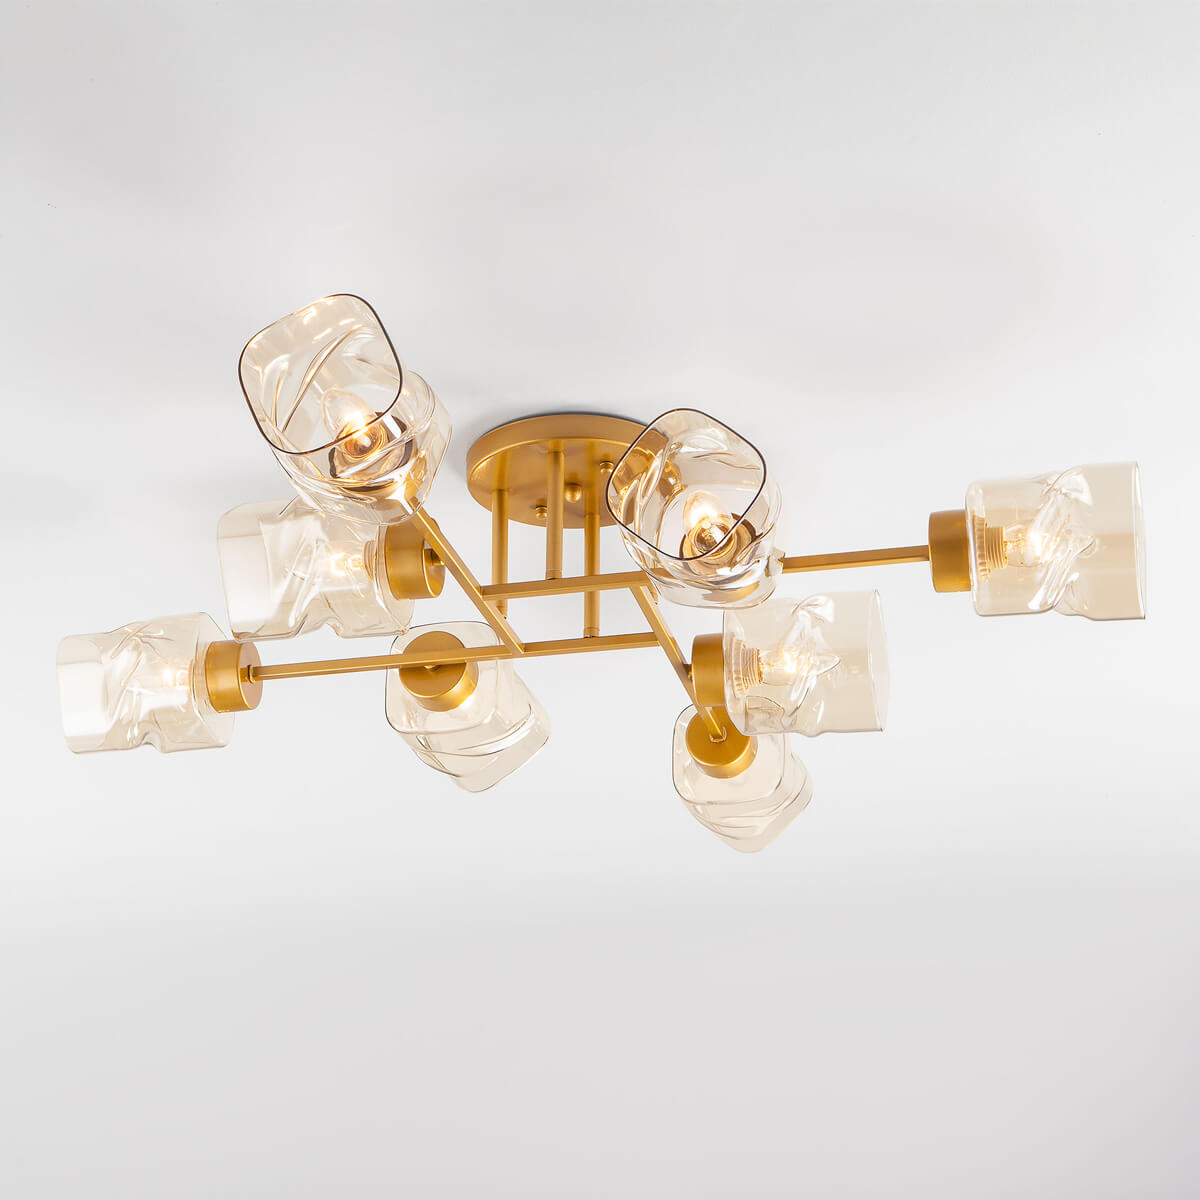 Люстра Eurosvet 30165/8 перламутровое золото Hilari люстра eurosvet 90054 8 золото twist gold